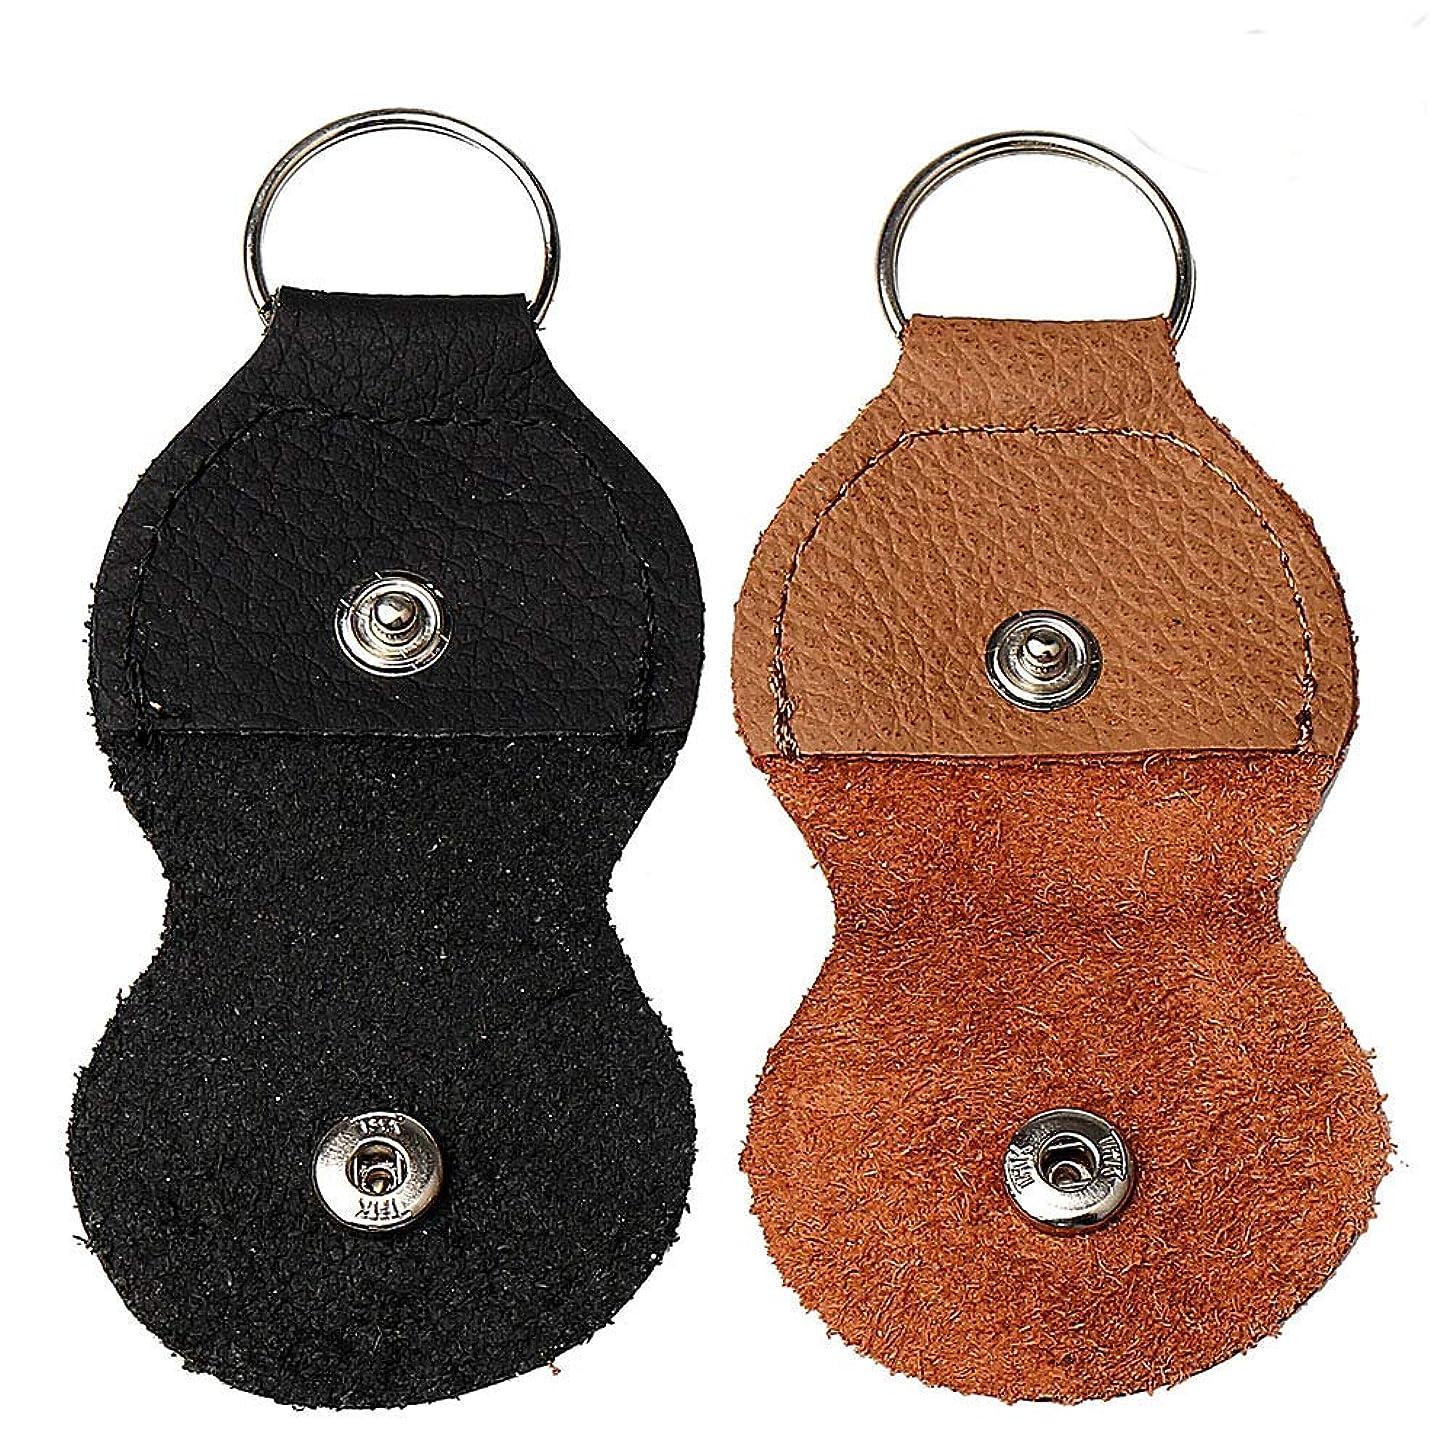 HSAN Picks Holder Case,2 Pcs Pick Holder Guitar Pick Case Pick Holder Keychain Leather Pick Holder Plectrum Key Fob Cases Bag